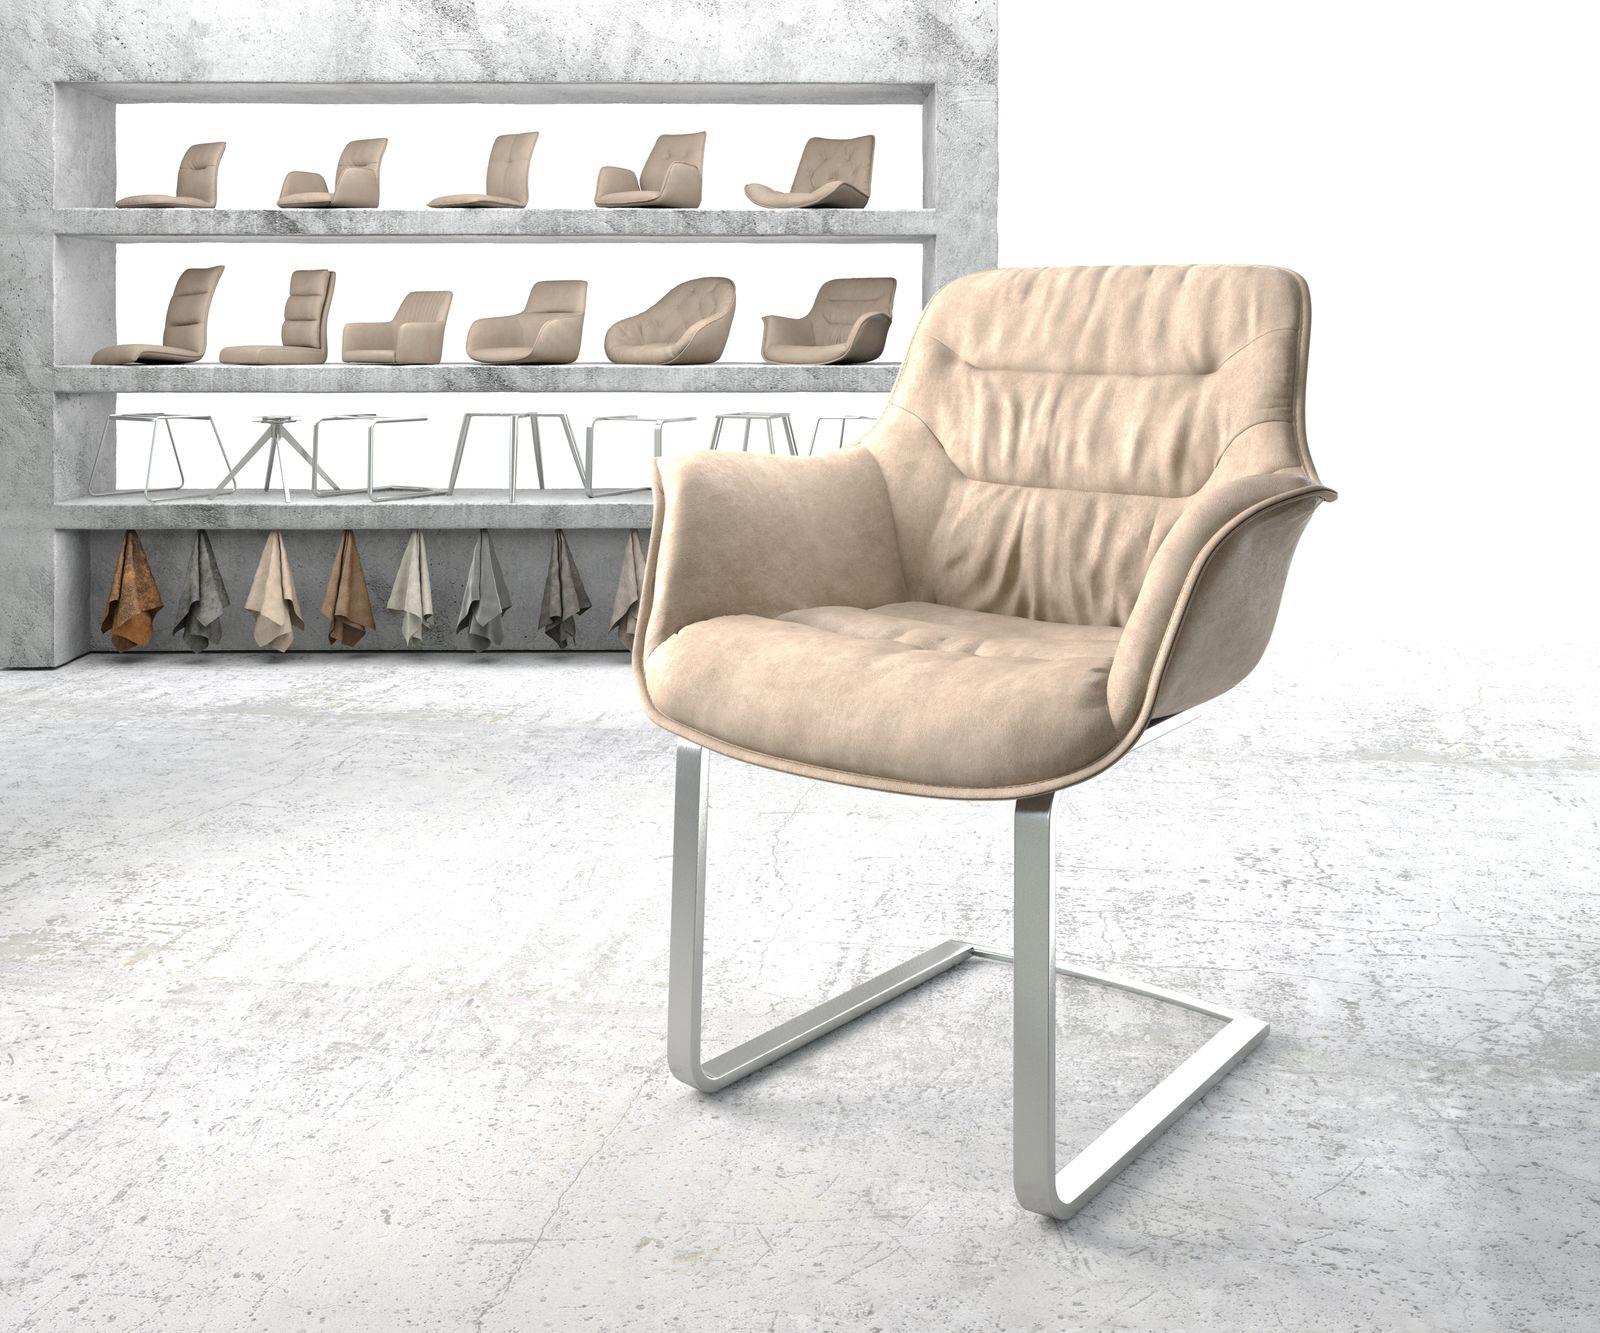 delife-armlehnstuhl-kaira-flex-beige-vintage-freischwinger-flach-edelstahl-esszimmerstuhle, 109.90 EUR @ delife-de